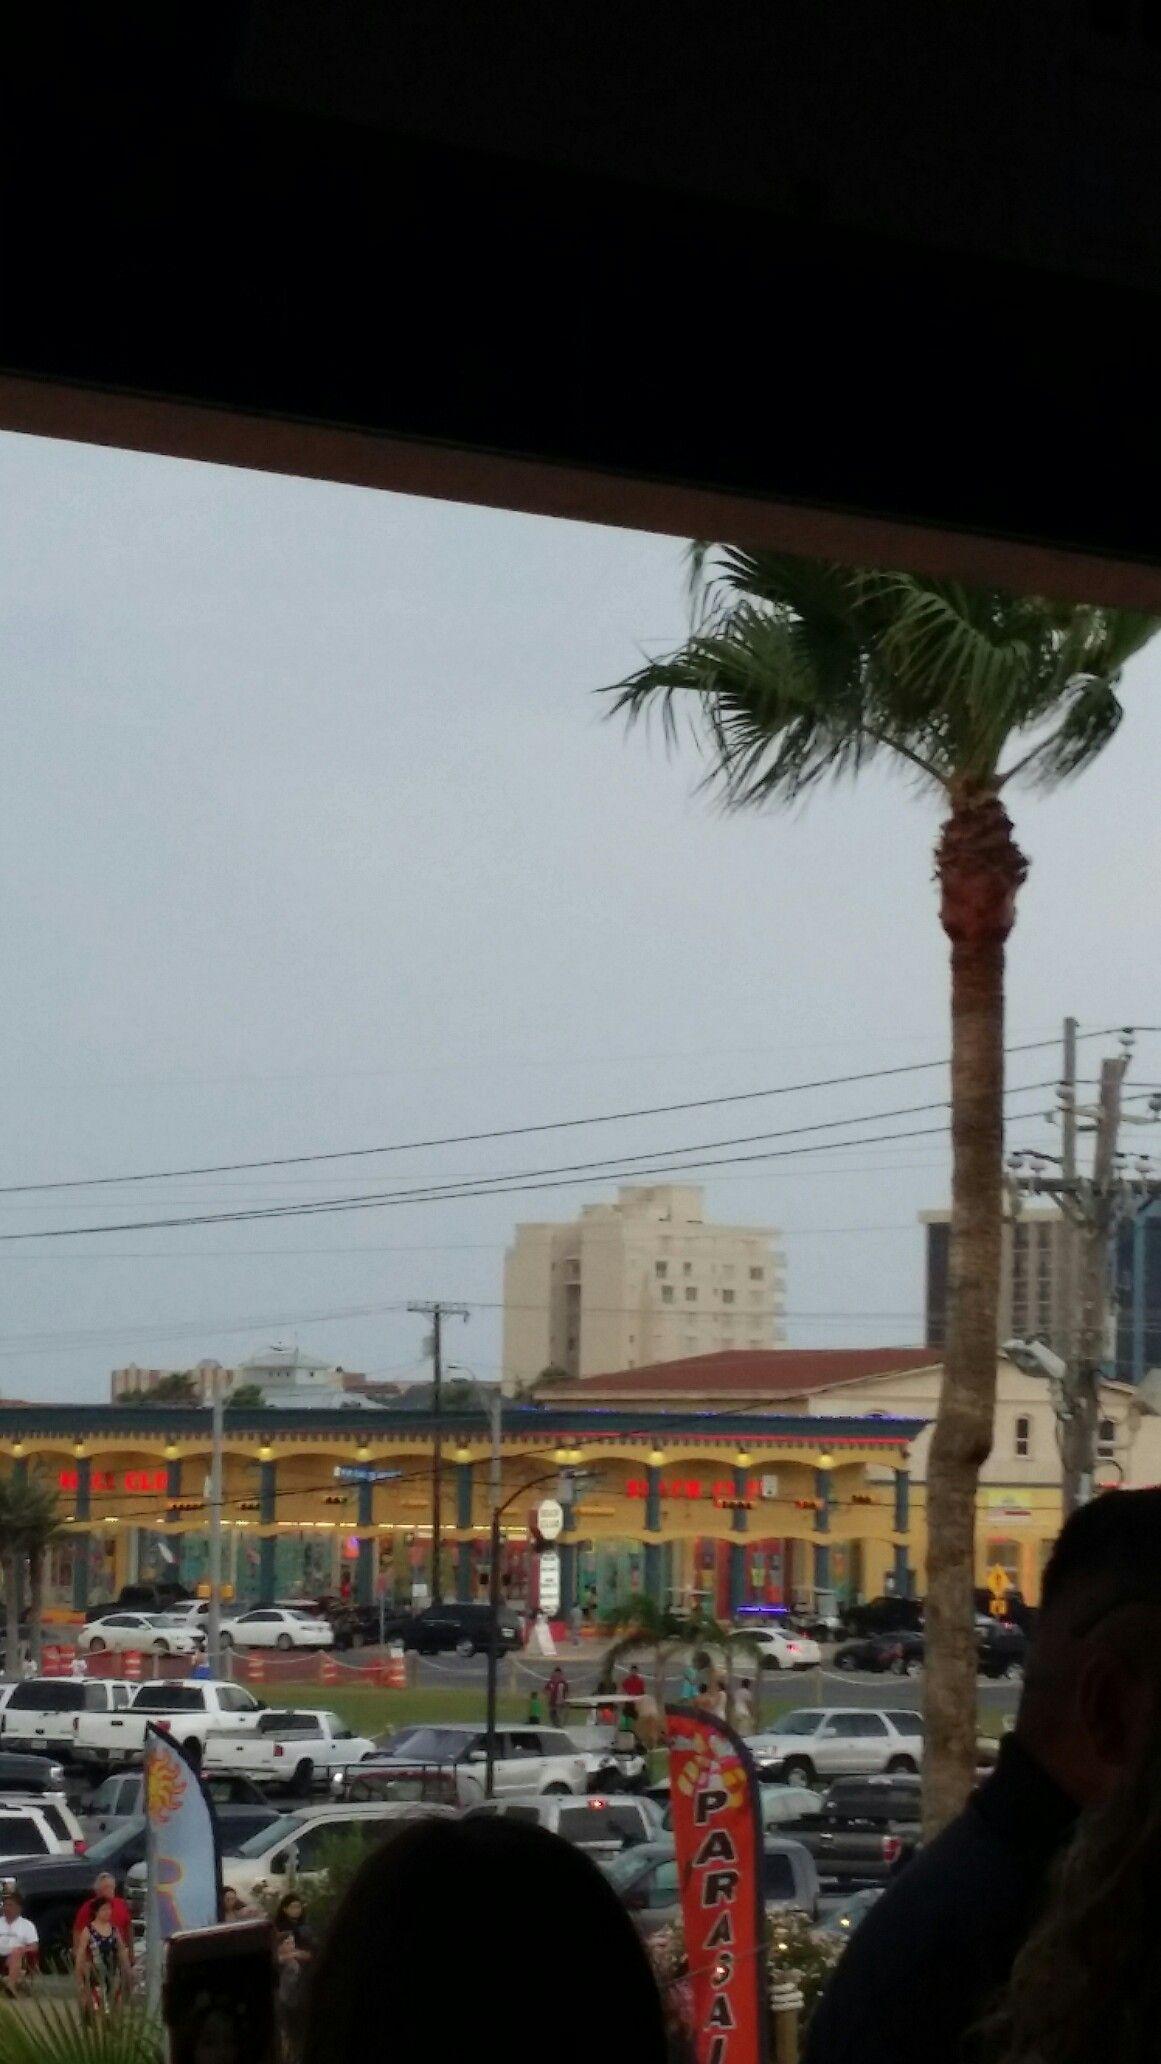 Starbucks South Padre Island